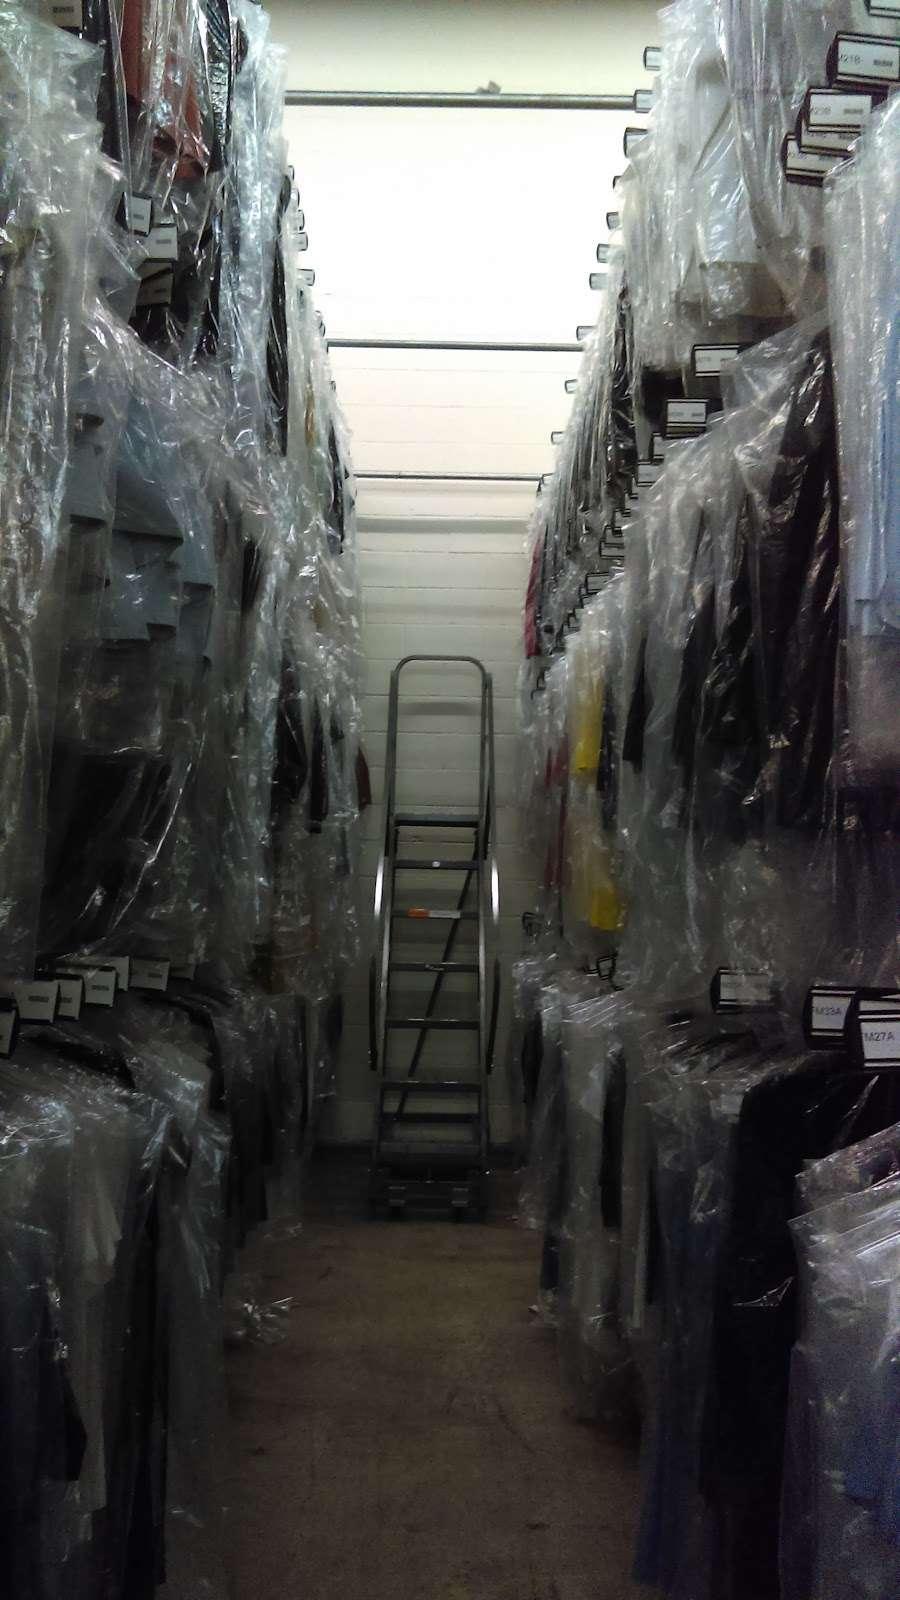 Port Logistics Group - storage    Photo 4 of 6   Address: 125 Castle Rd, Secaucus, NJ 07094, USA   Phone: (201) 865-2121